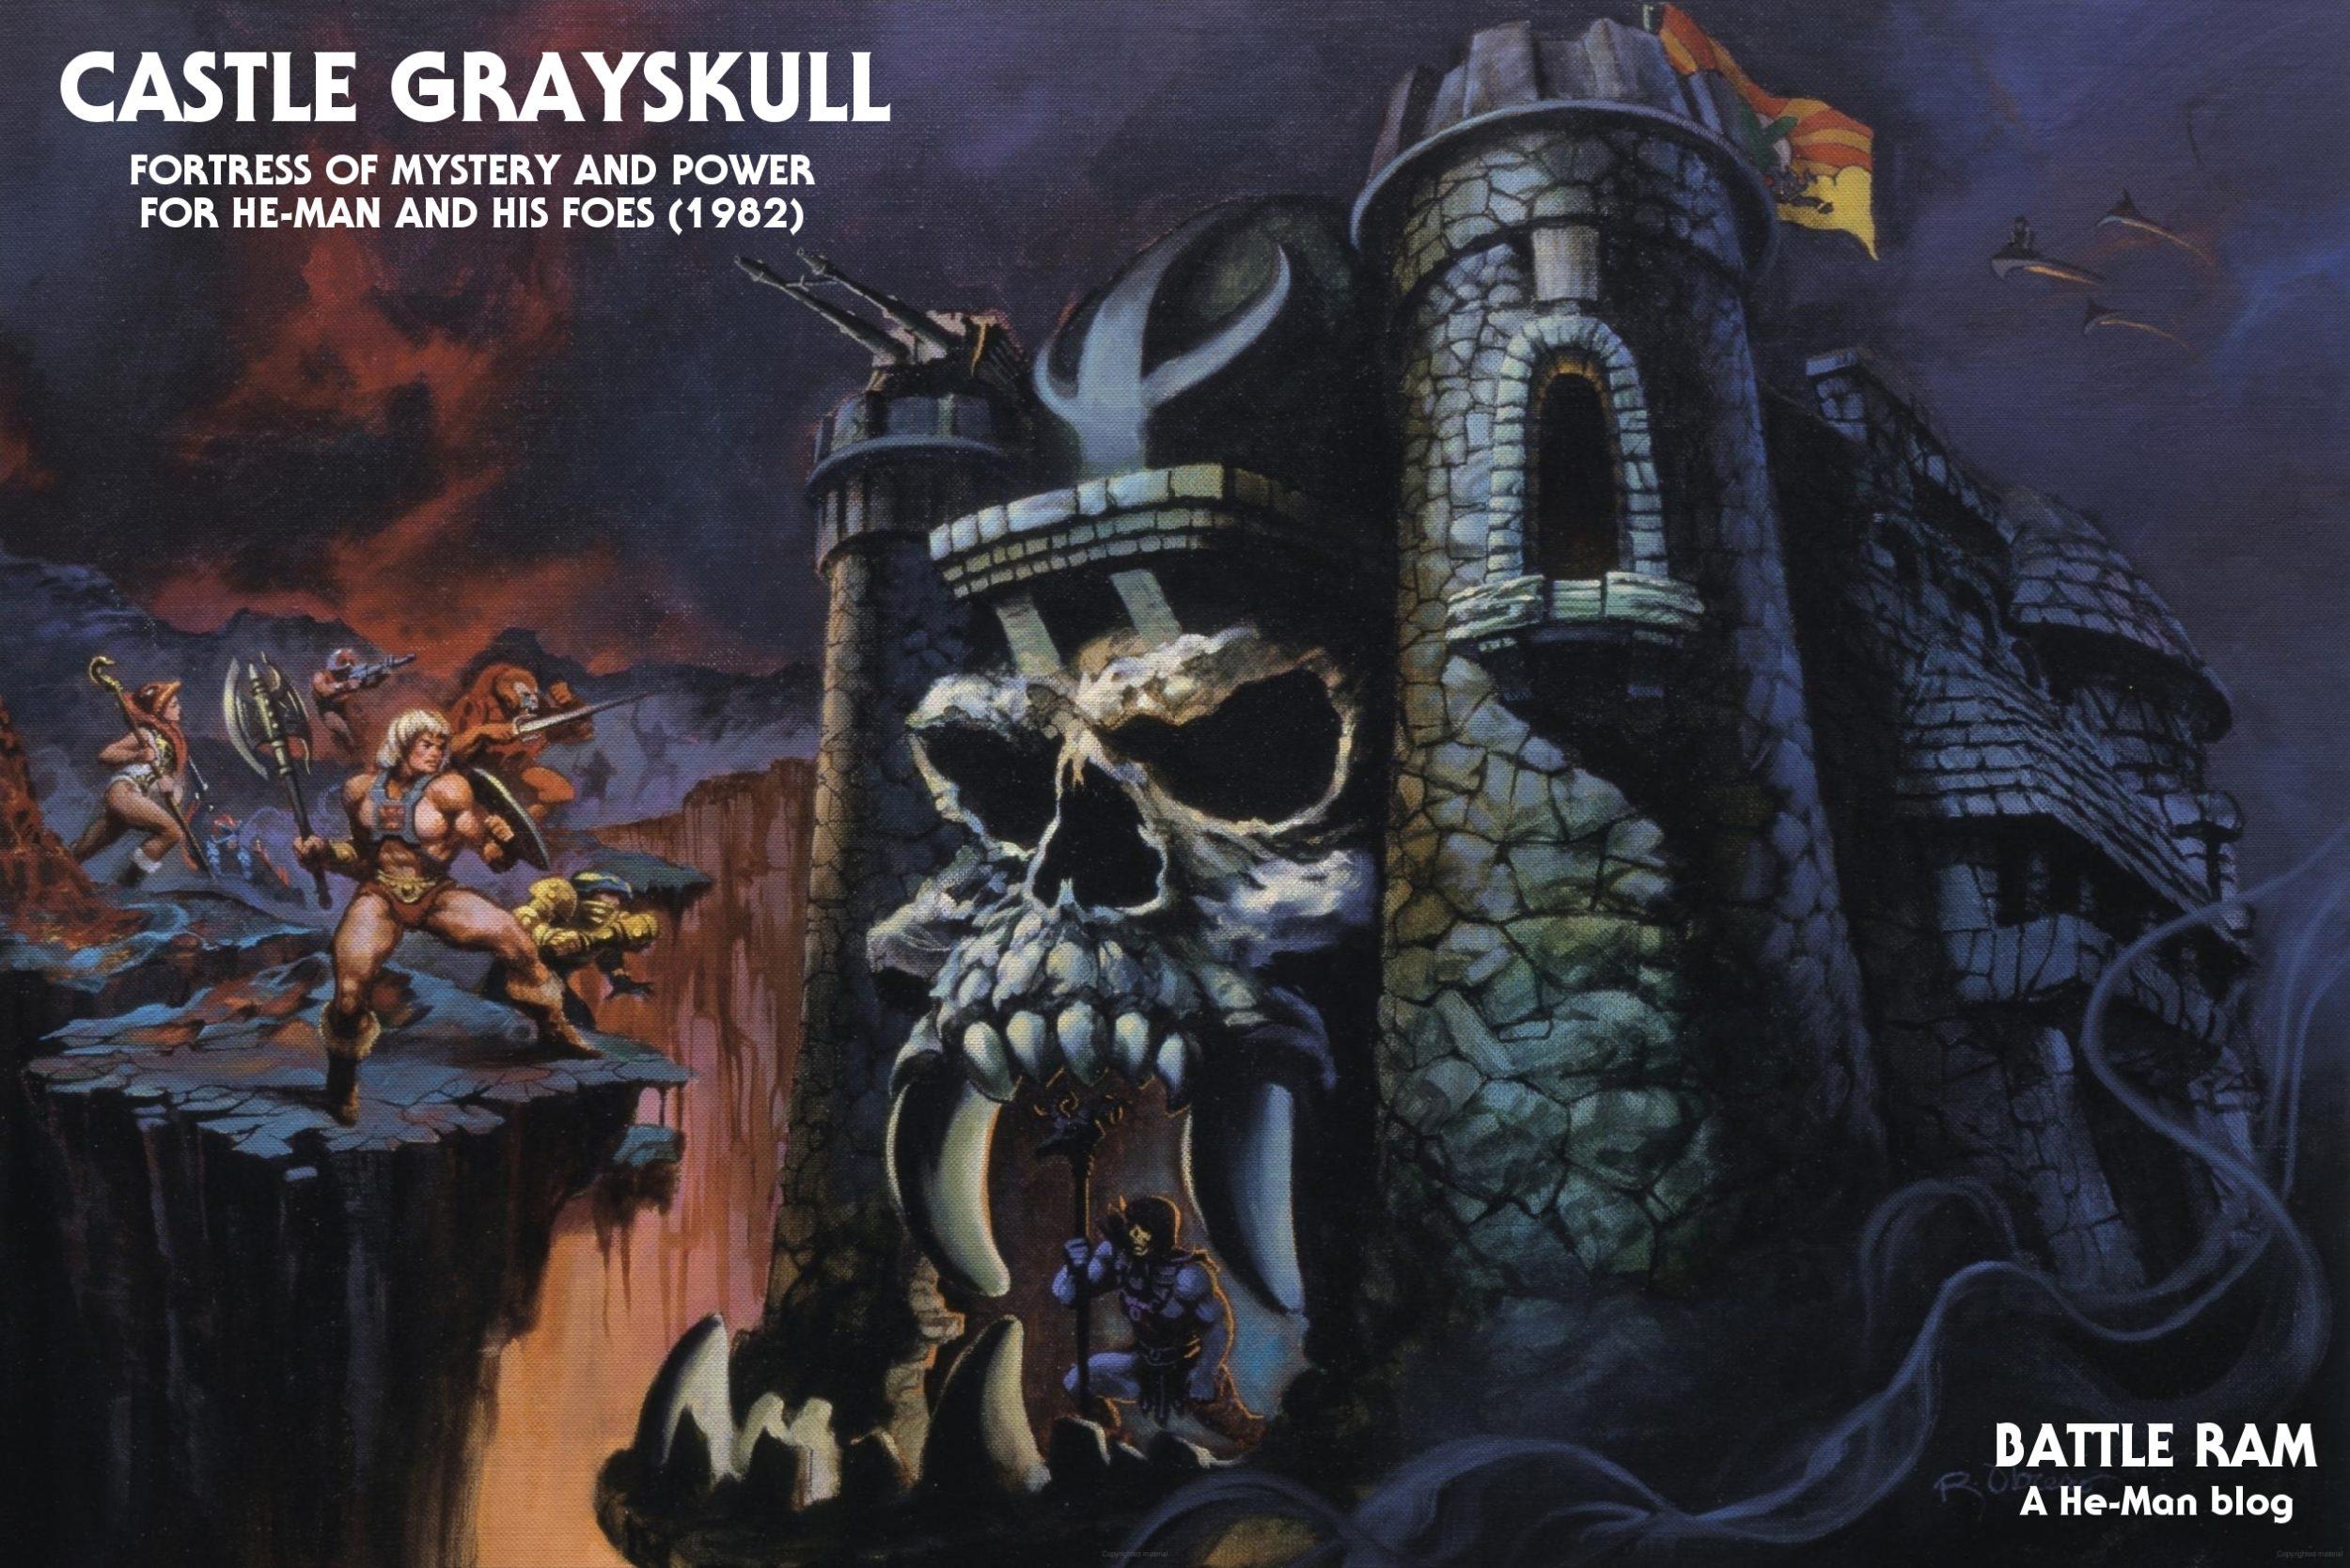 Buy masters of the universe mega construx castle grayskull set mattel